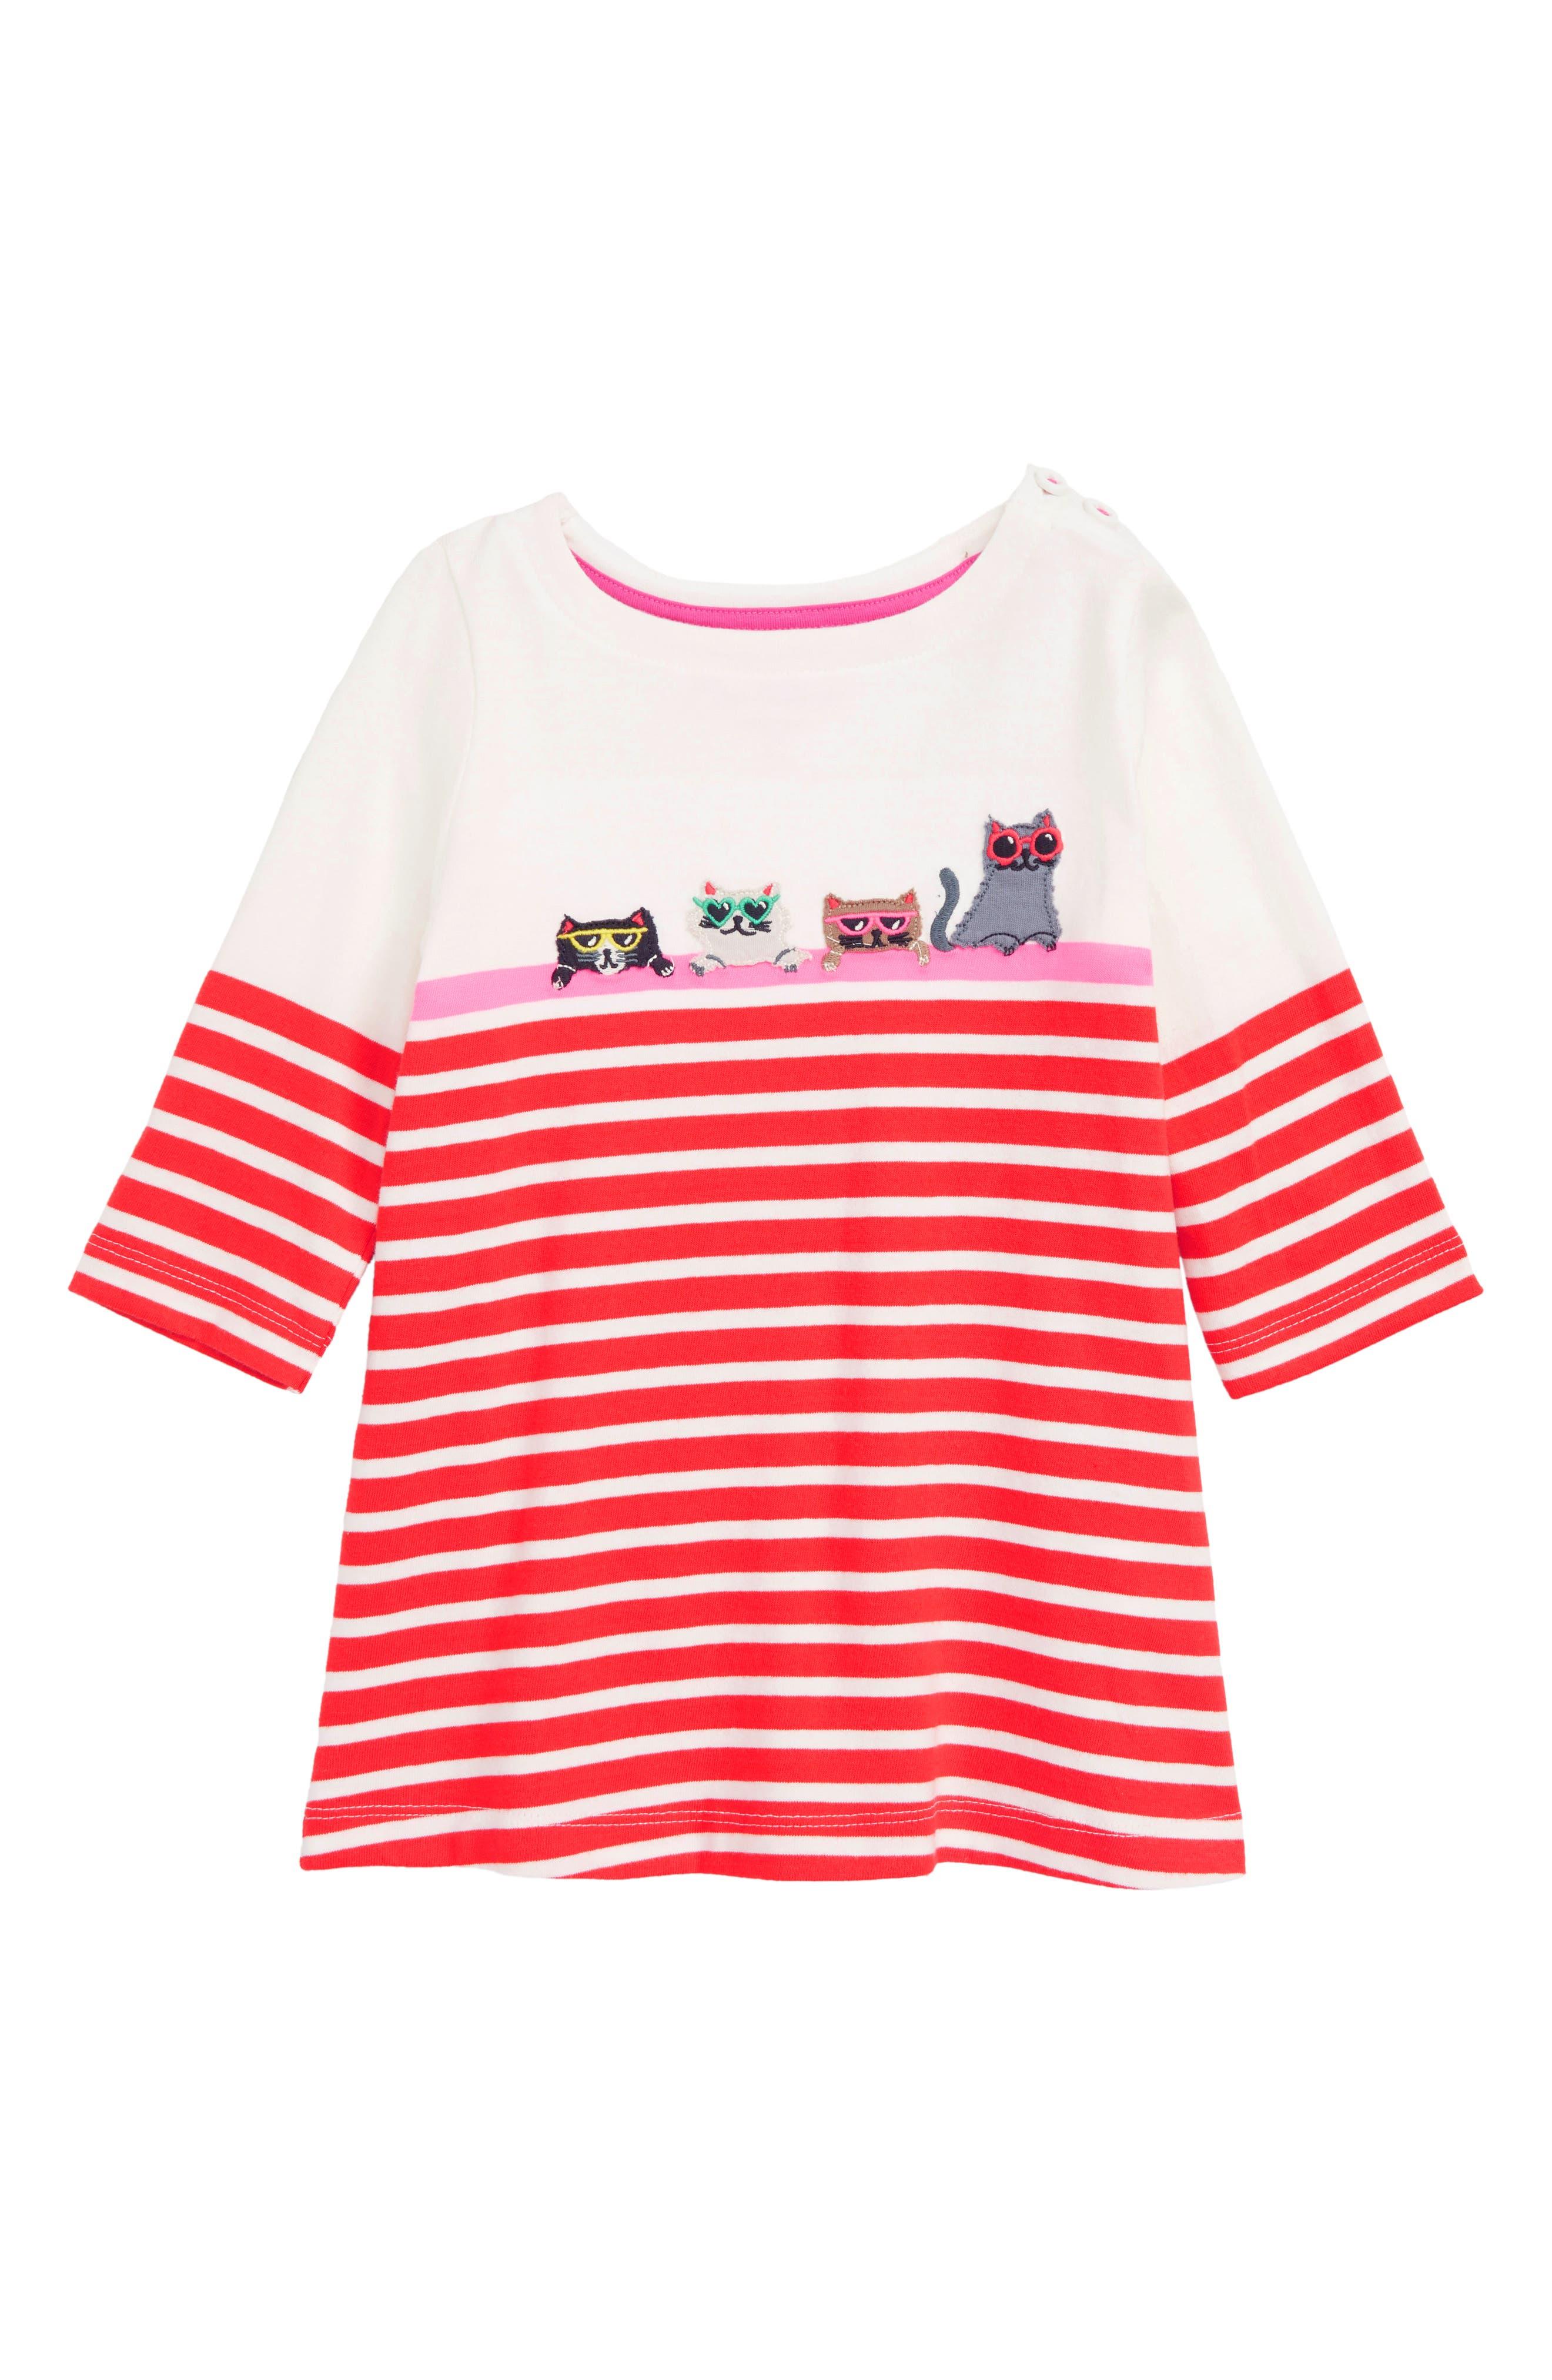 MINI BODEN,                             Stripe Appliqué Tunic,                             Main thumbnail 1, color,                             614